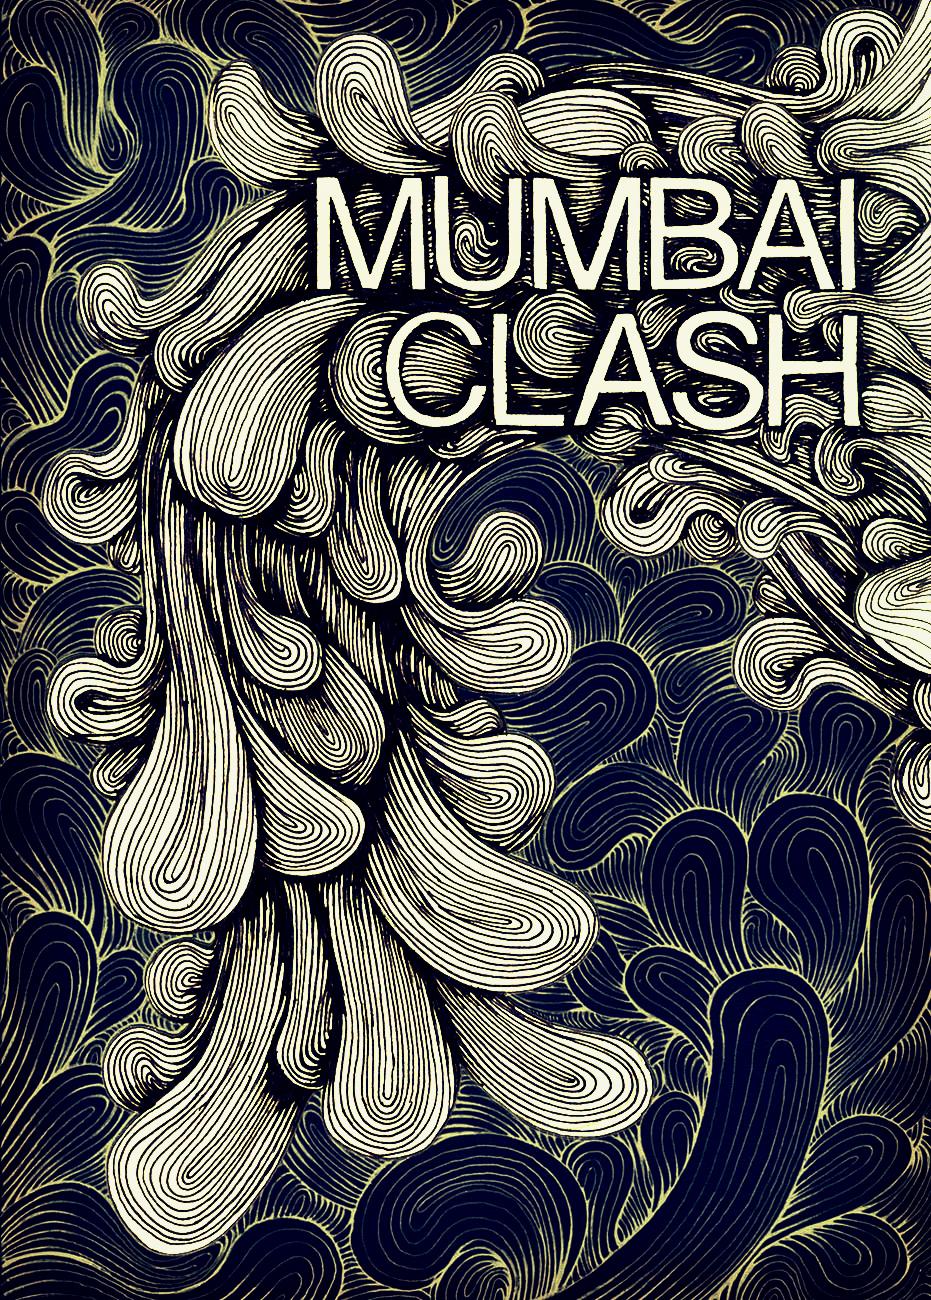 9 Mumbai ClachB.jpg